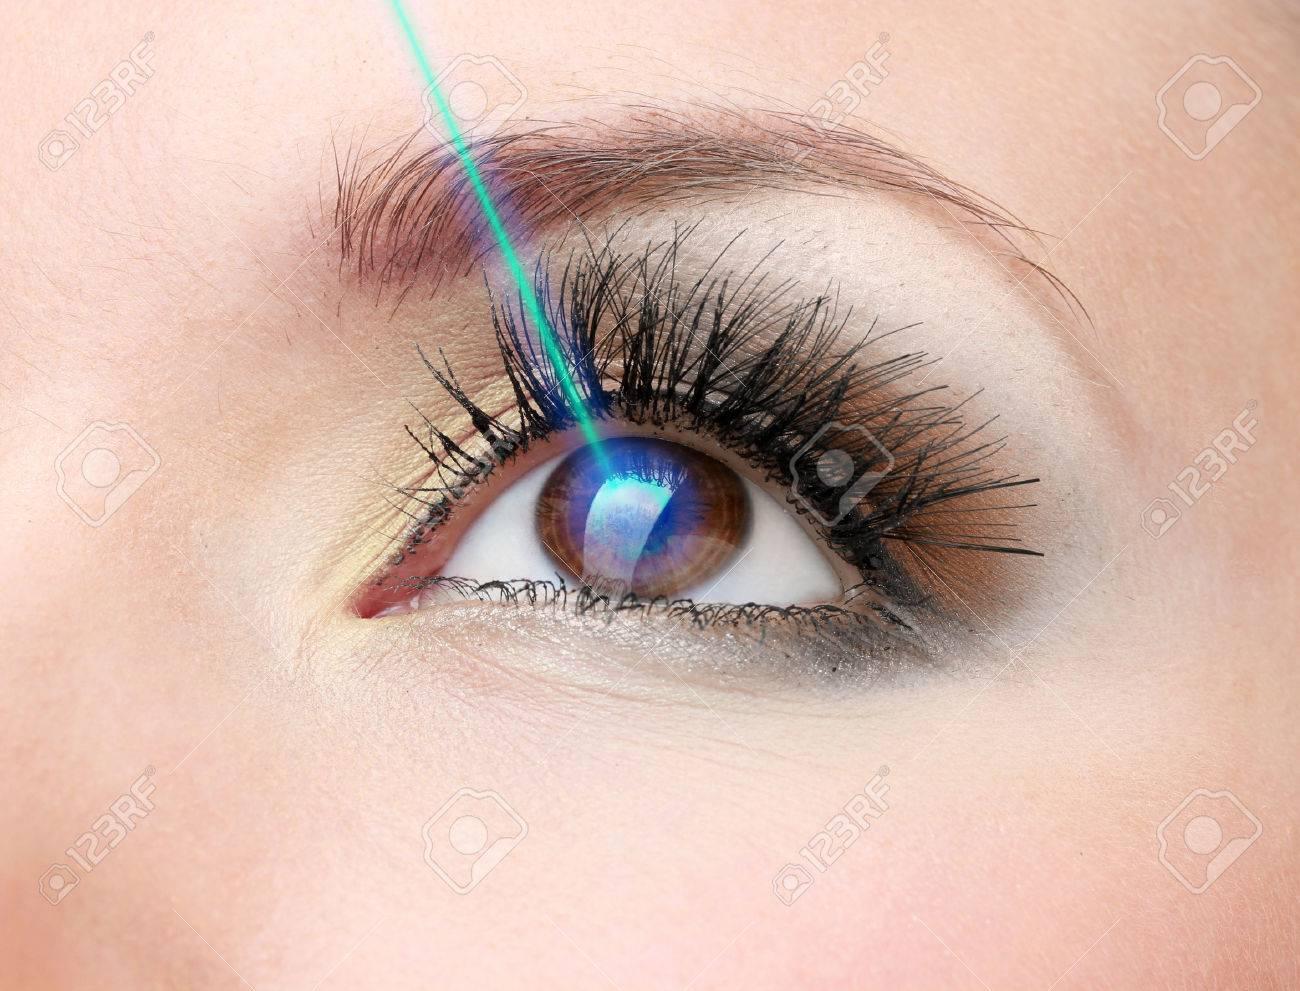 Laser vision correction. Woman's eye. - 26413644